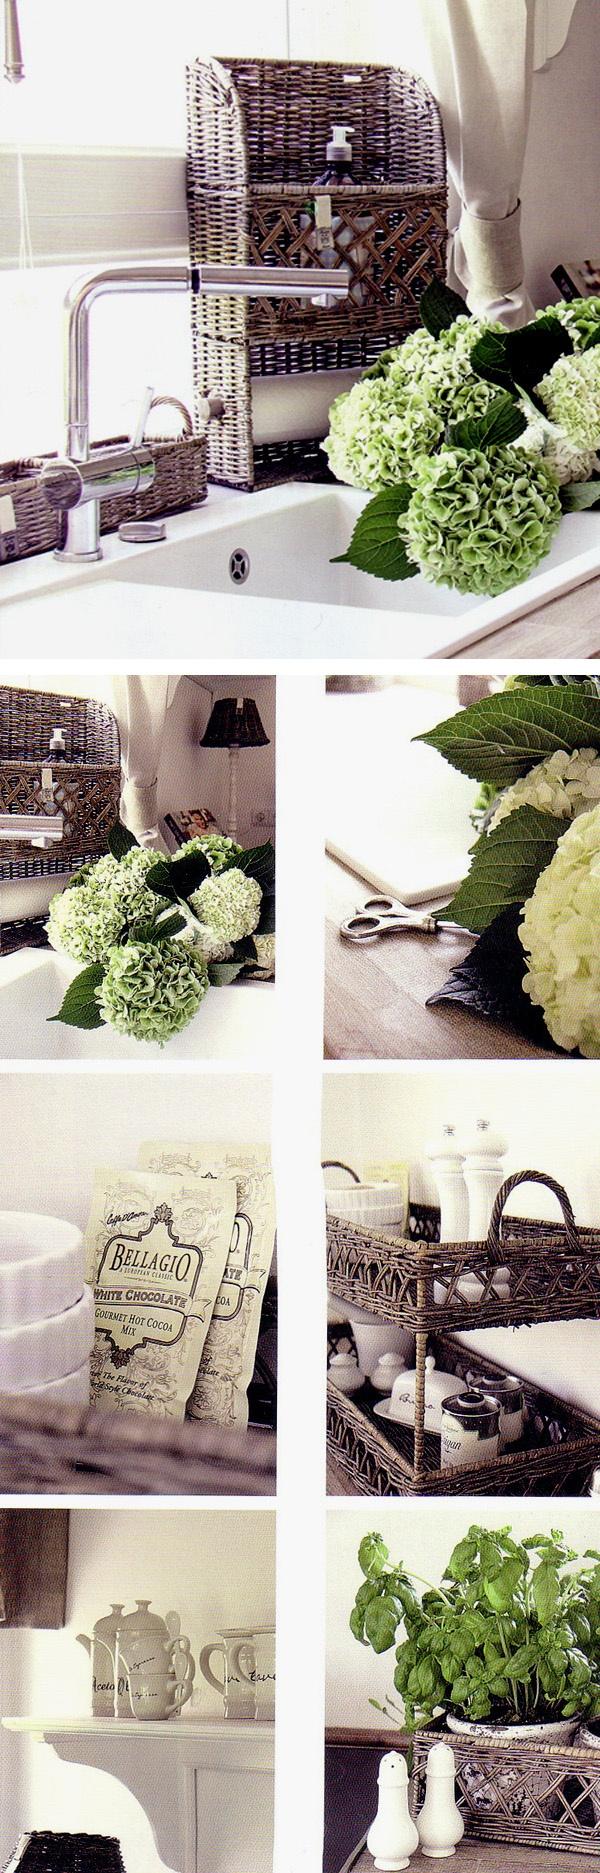 "Relating to the kitchen sink (from the book ""Belle Blanc"" by Mirjana Schnepf Bianca Aurich)"